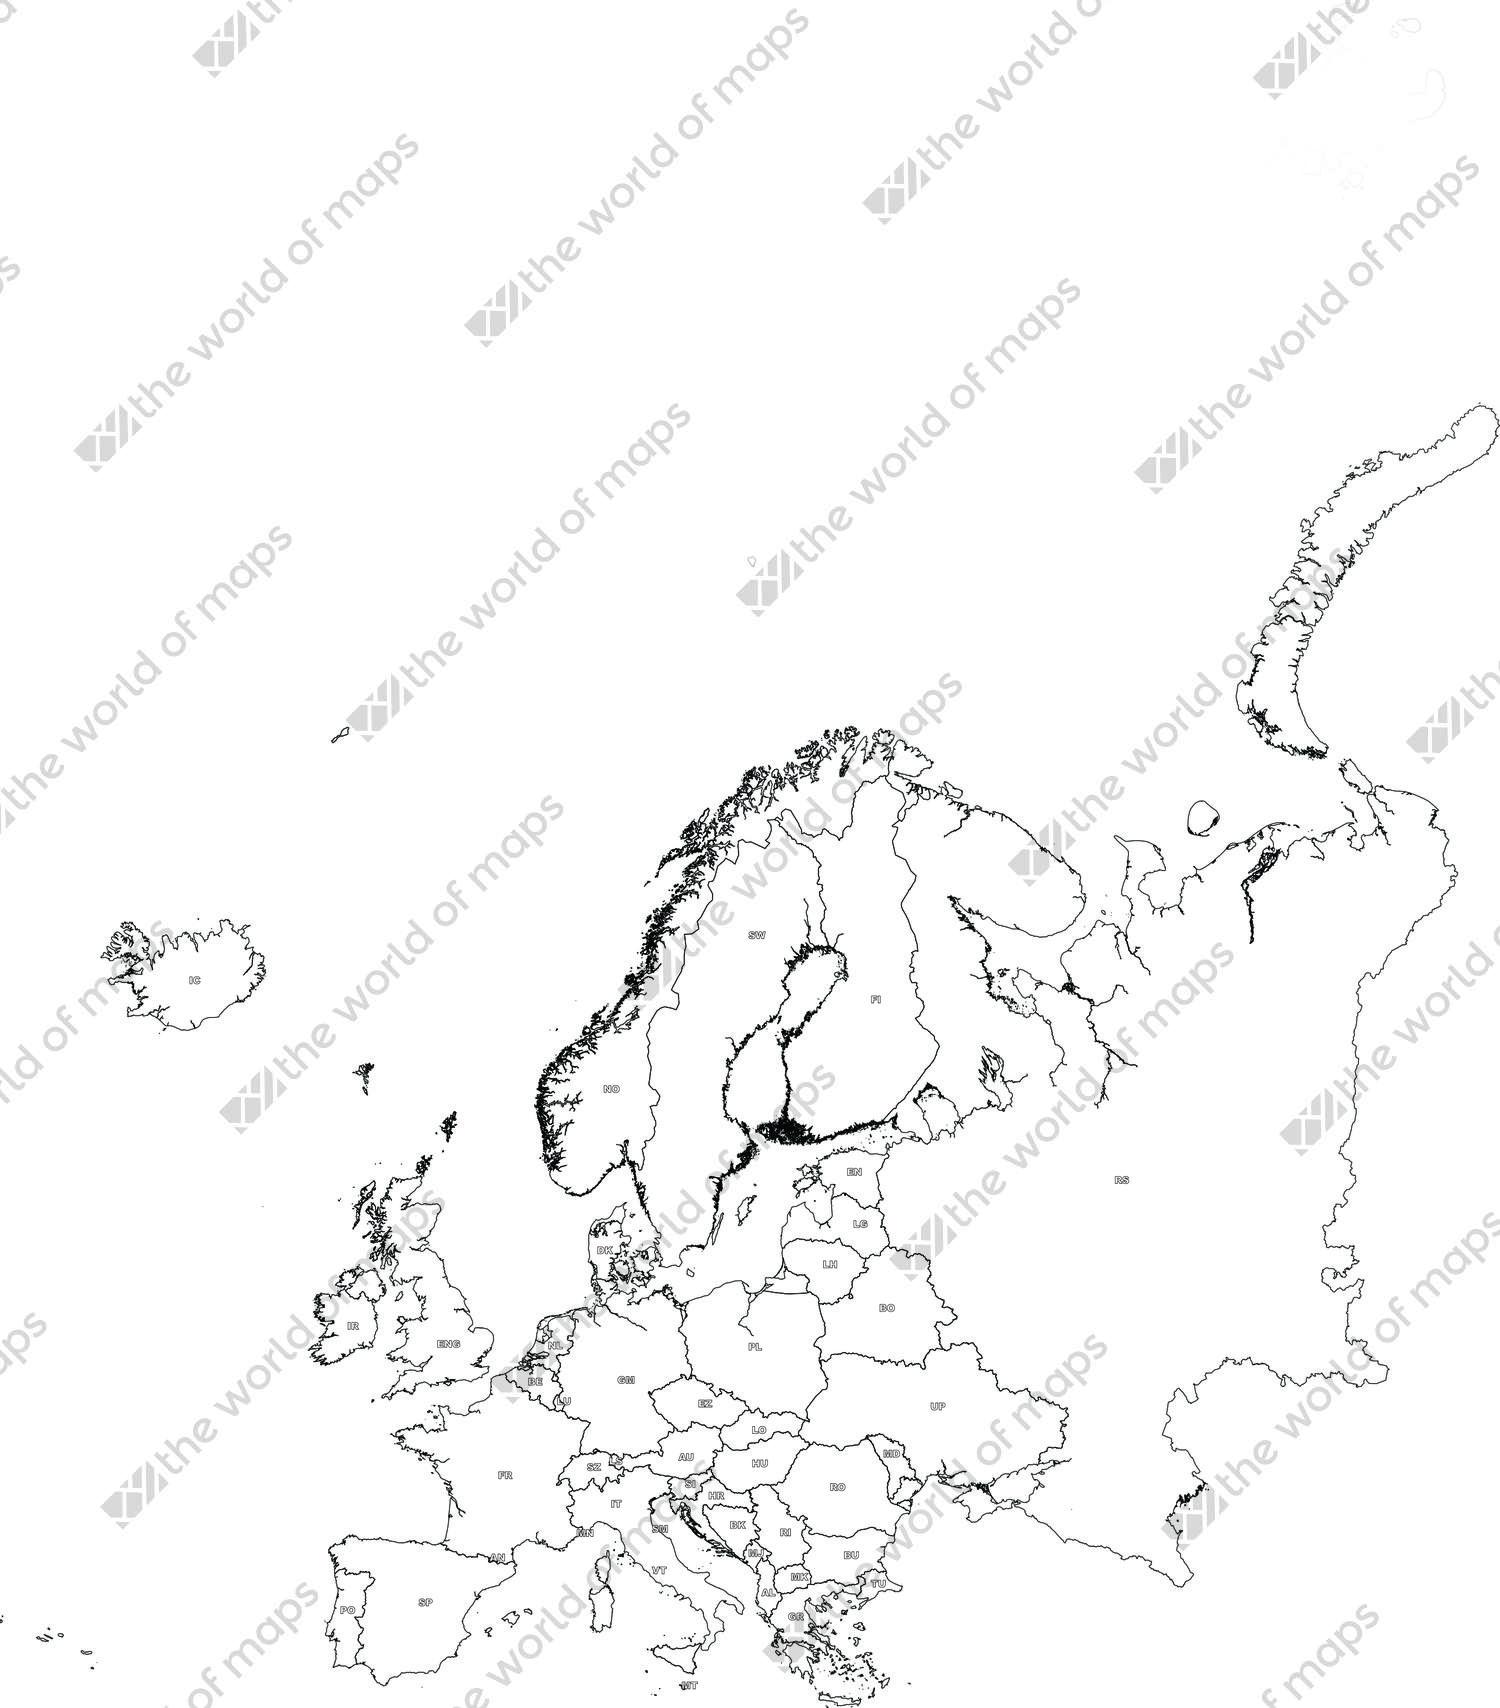 1500x1708 Digital Map Europe (Free) The World